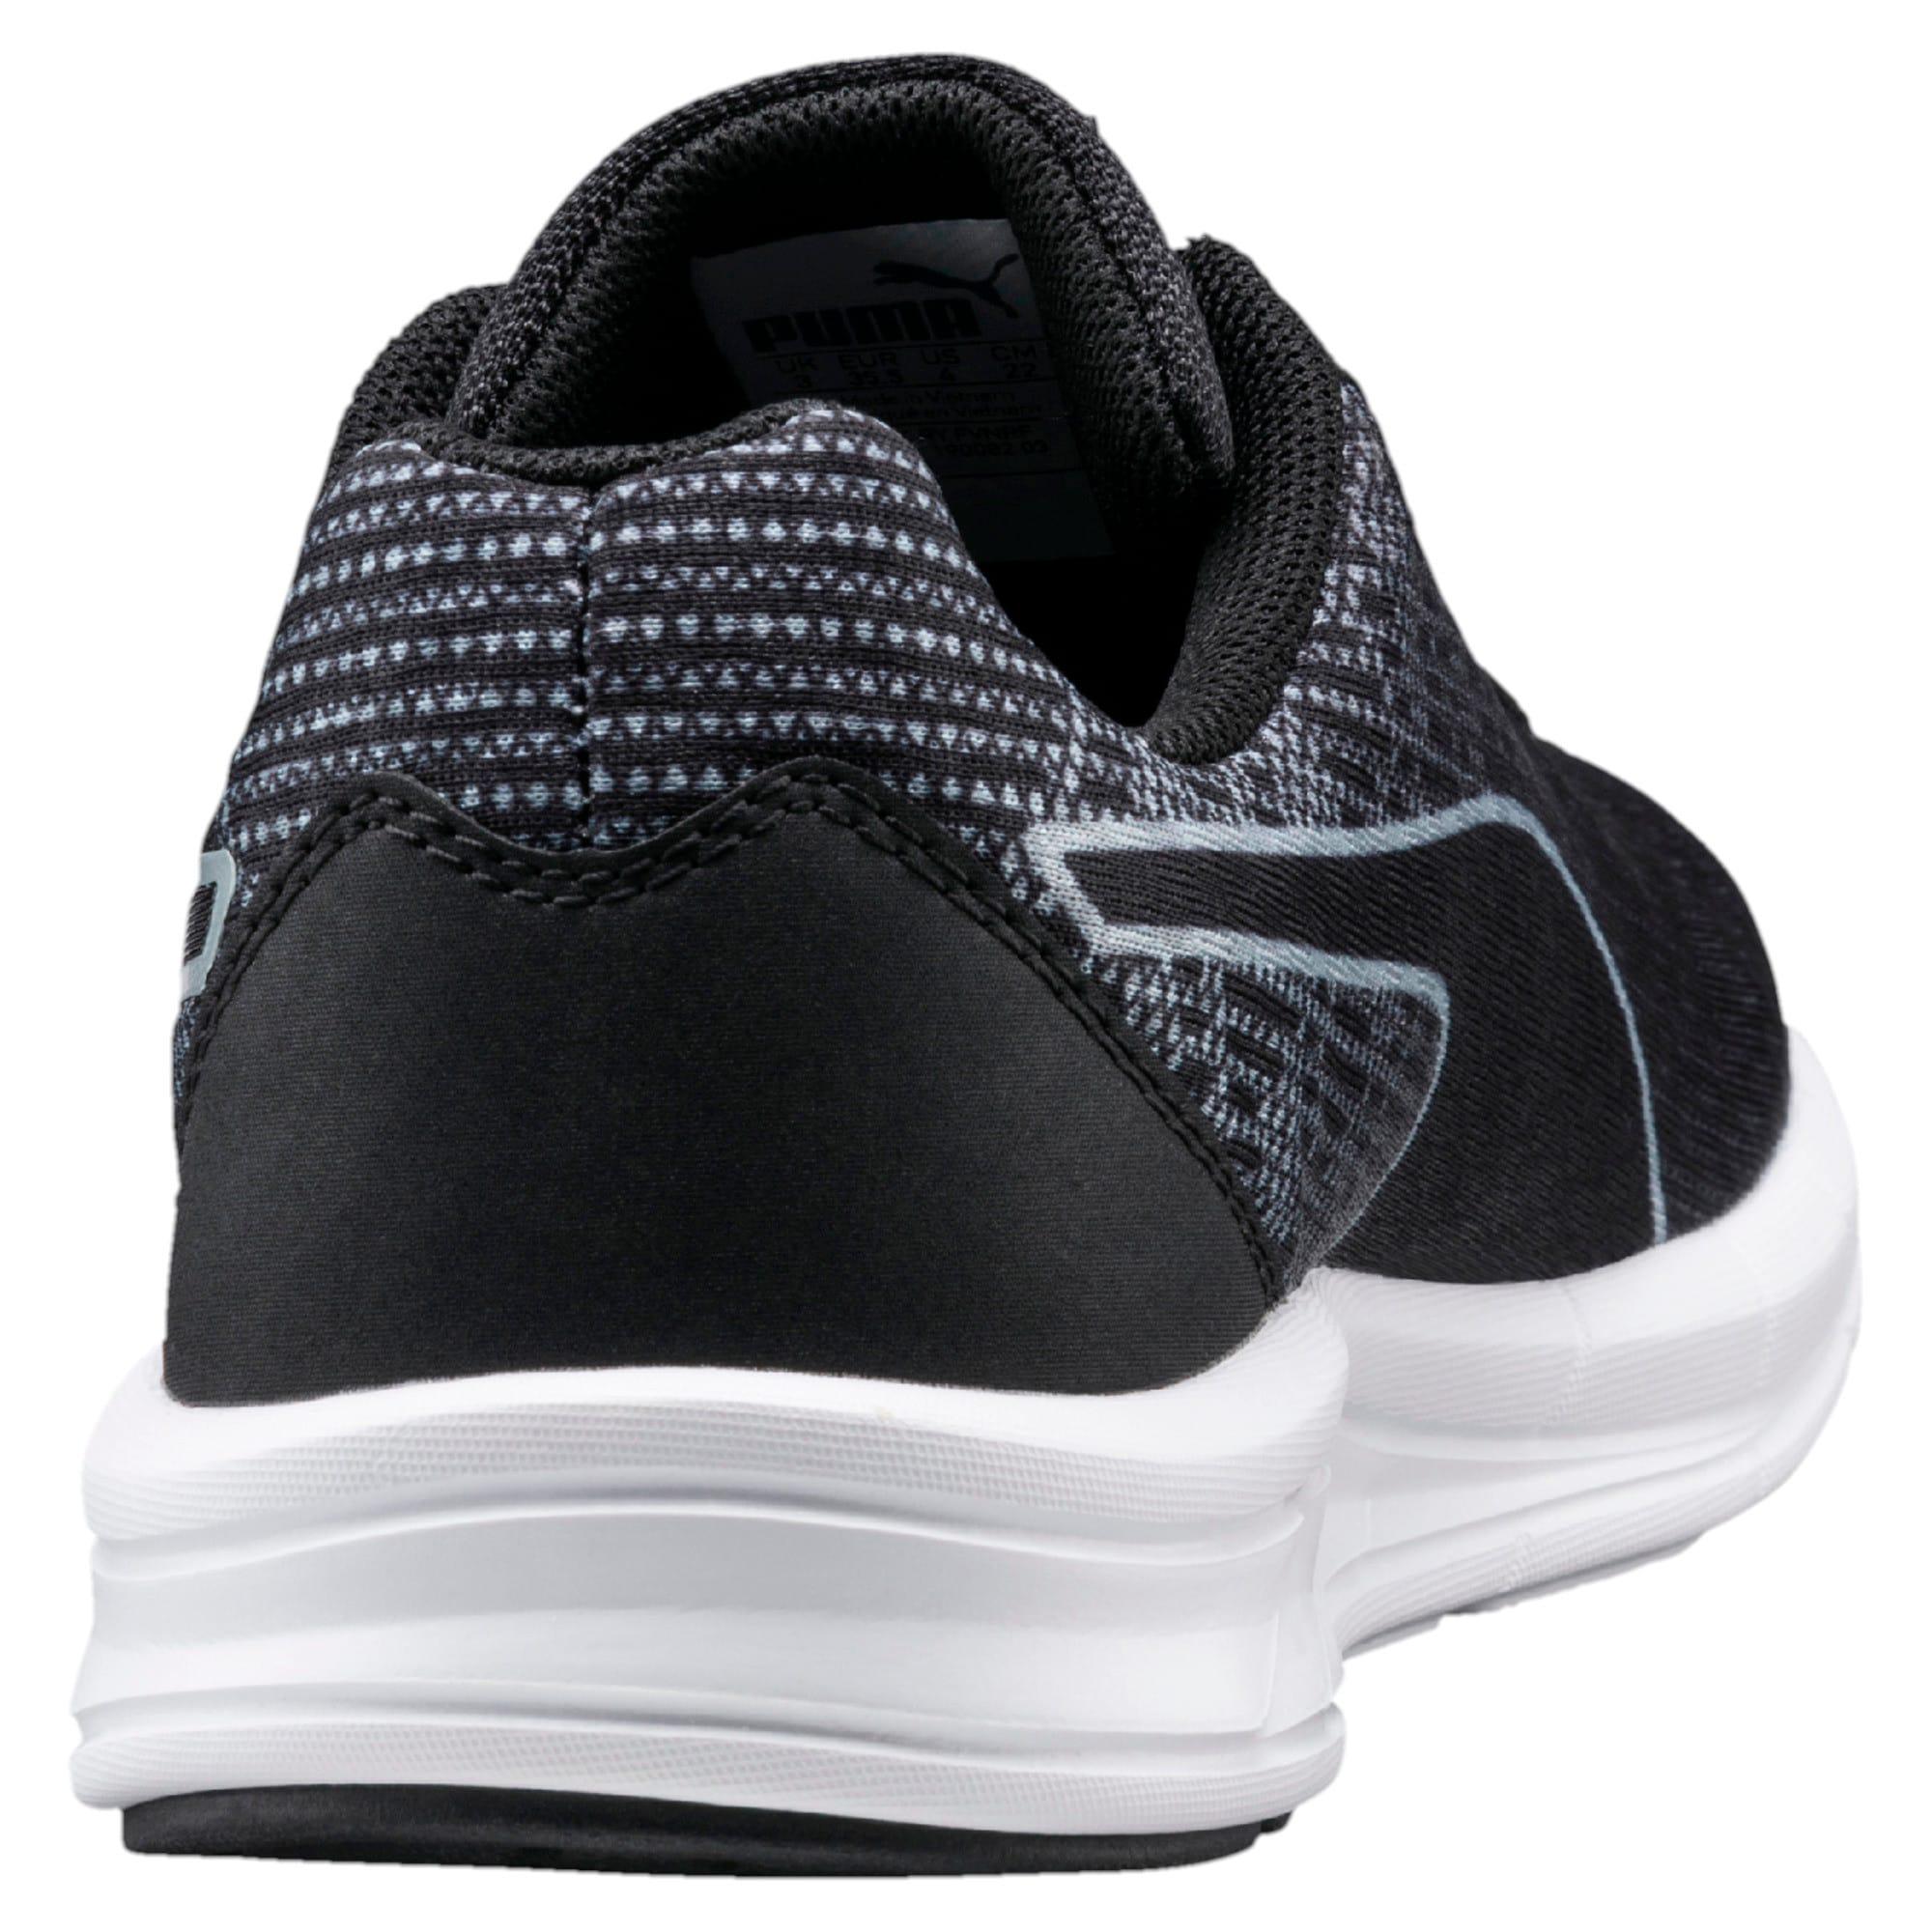 Thumbnail 3 of Comet Kids' Running Shoes, Quarry-Puma Black, medium-IND